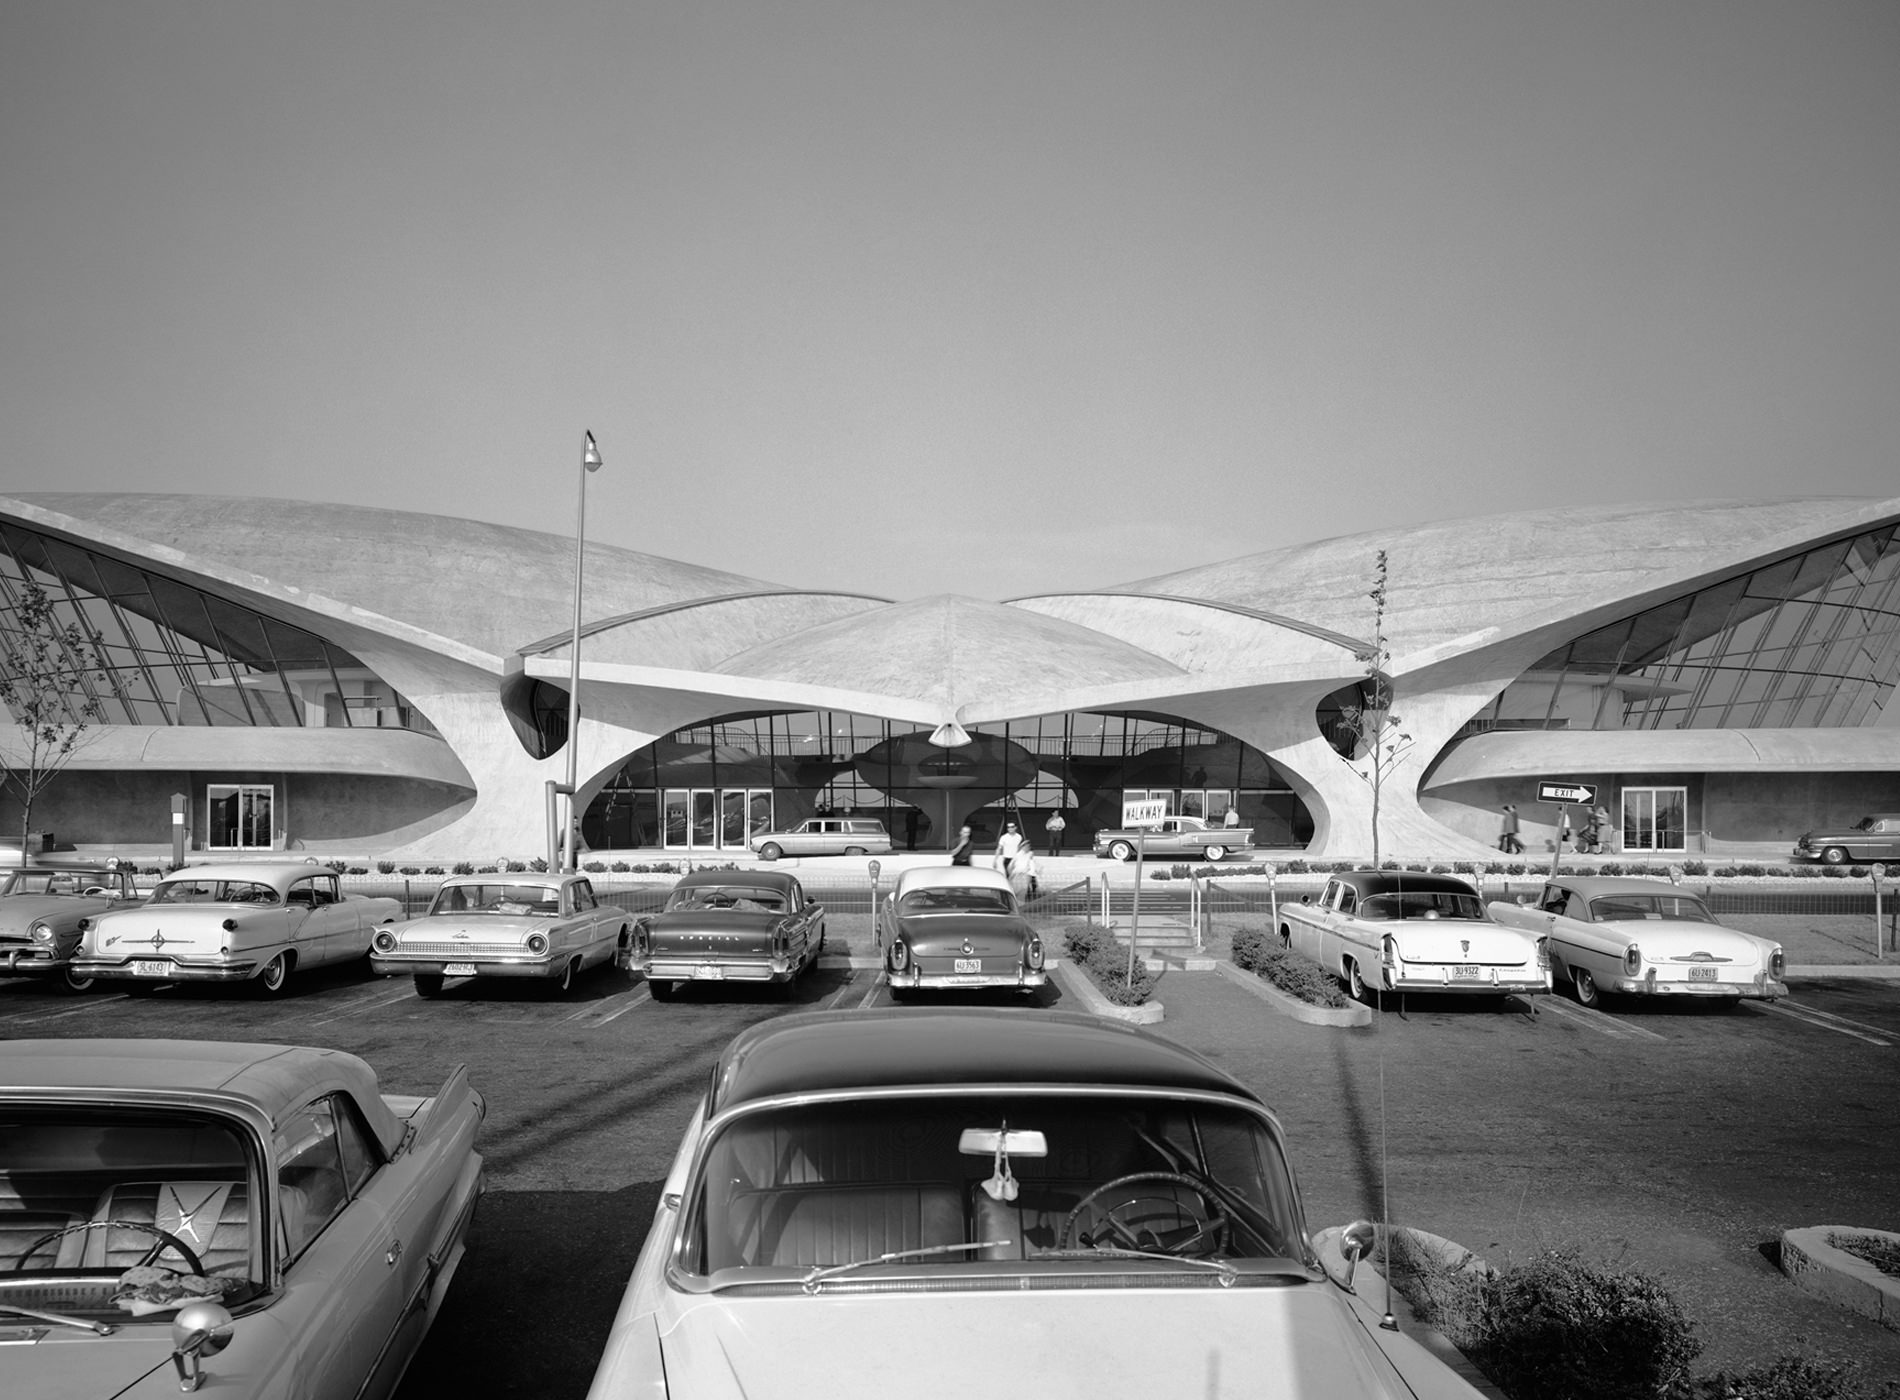 TWA Hotel New York JFK Airport TWA Flight Center Archive Vue Ensemble Ezra Stoller